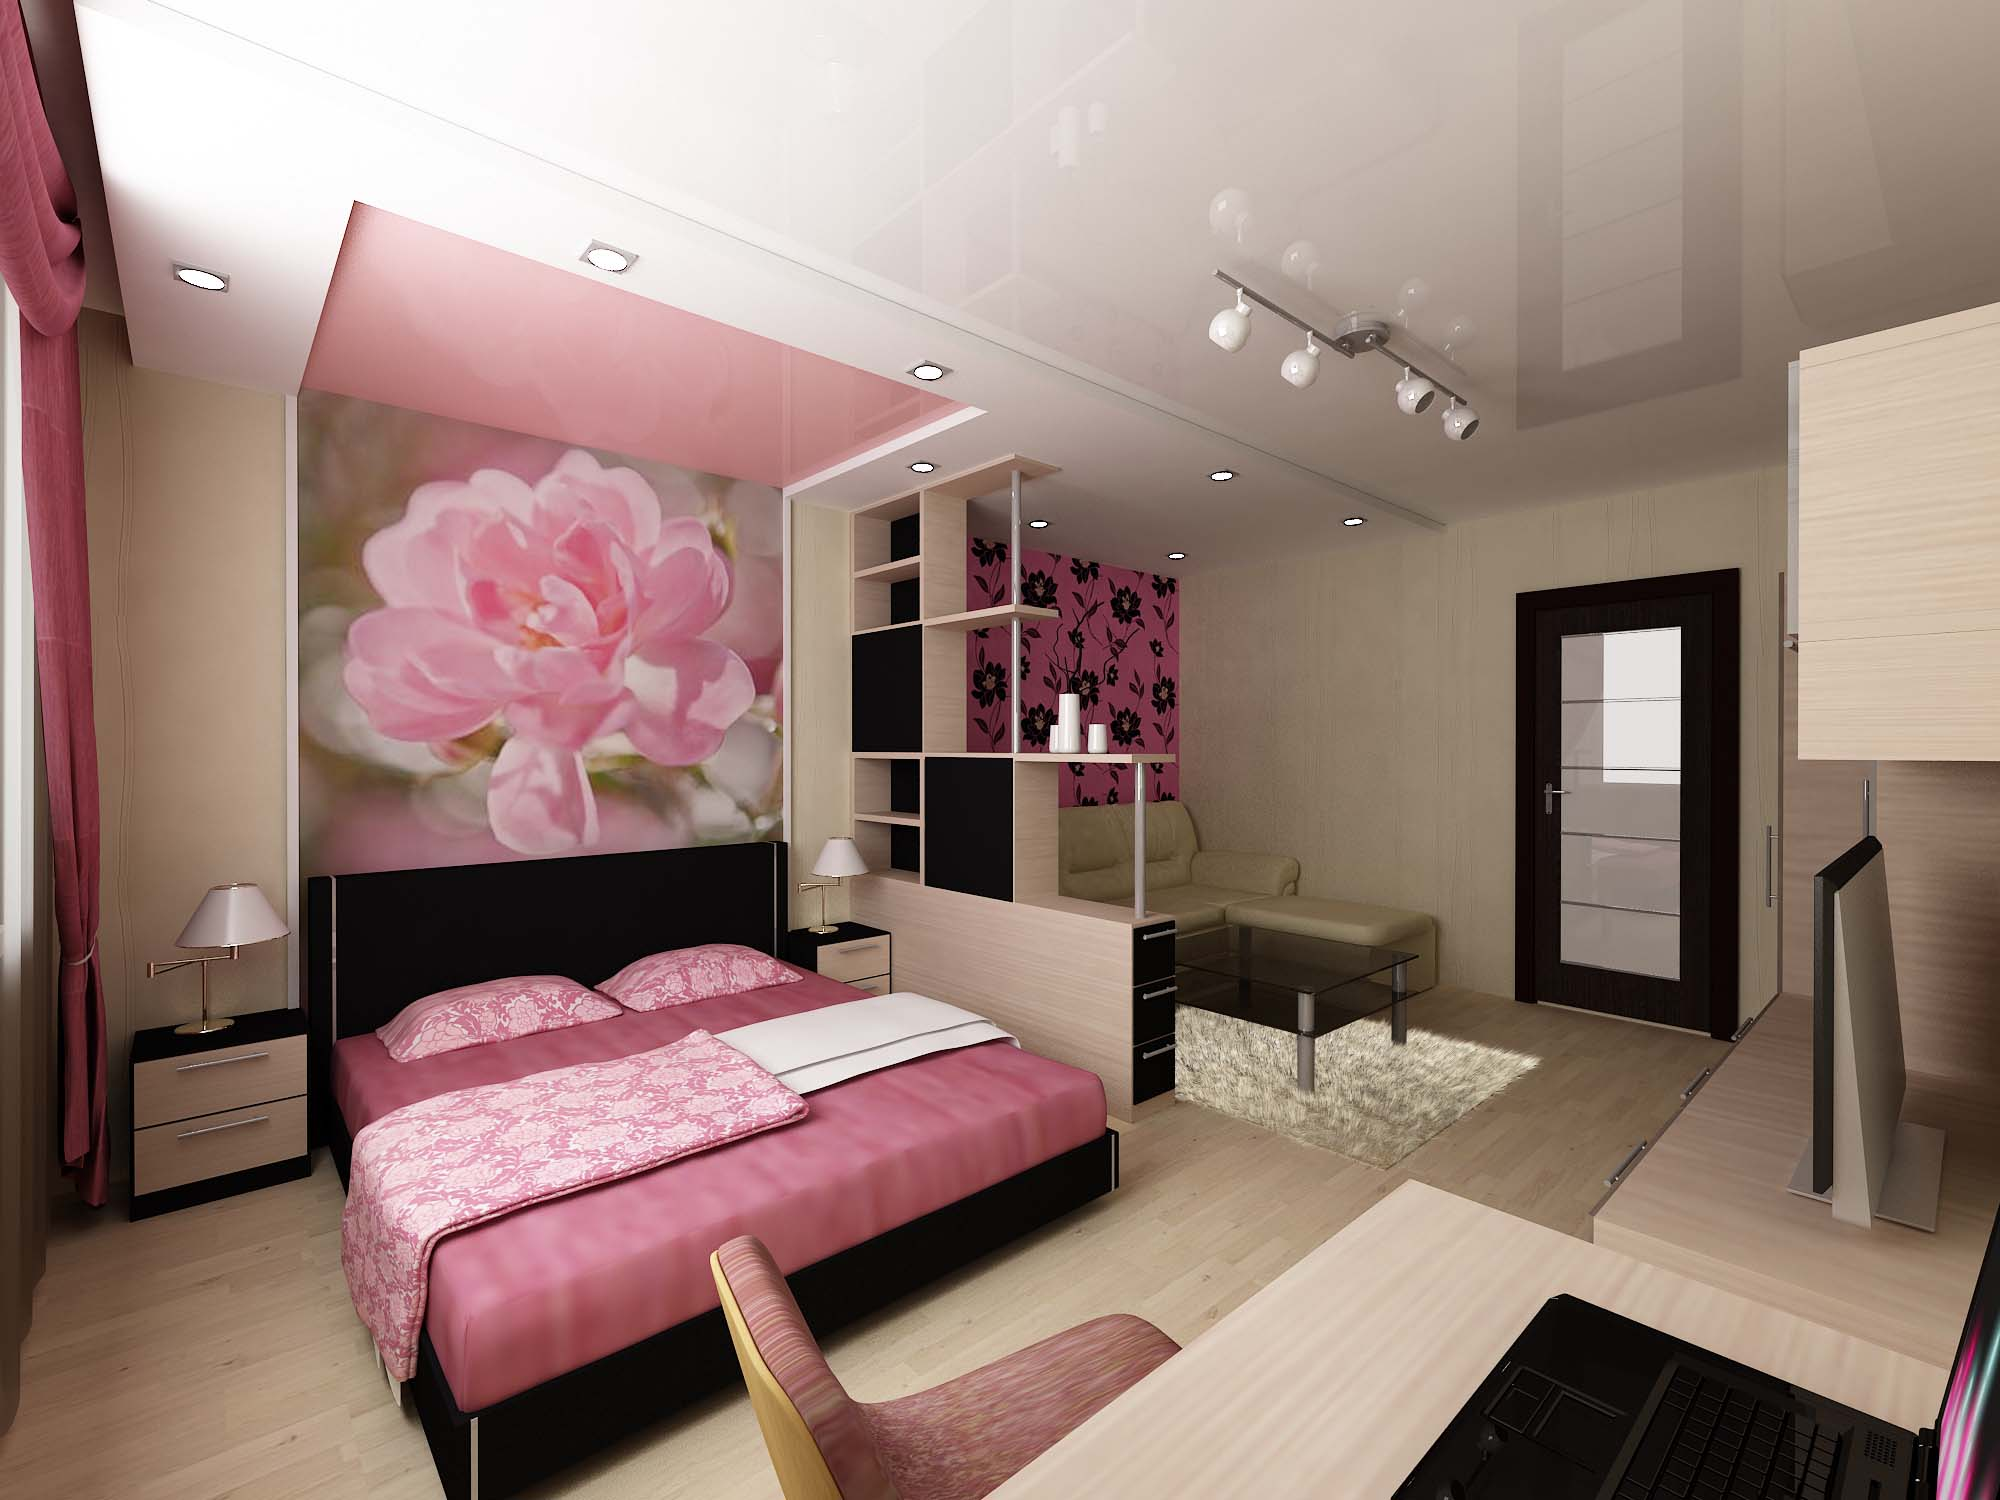 Однокомнатная квартира дизайн